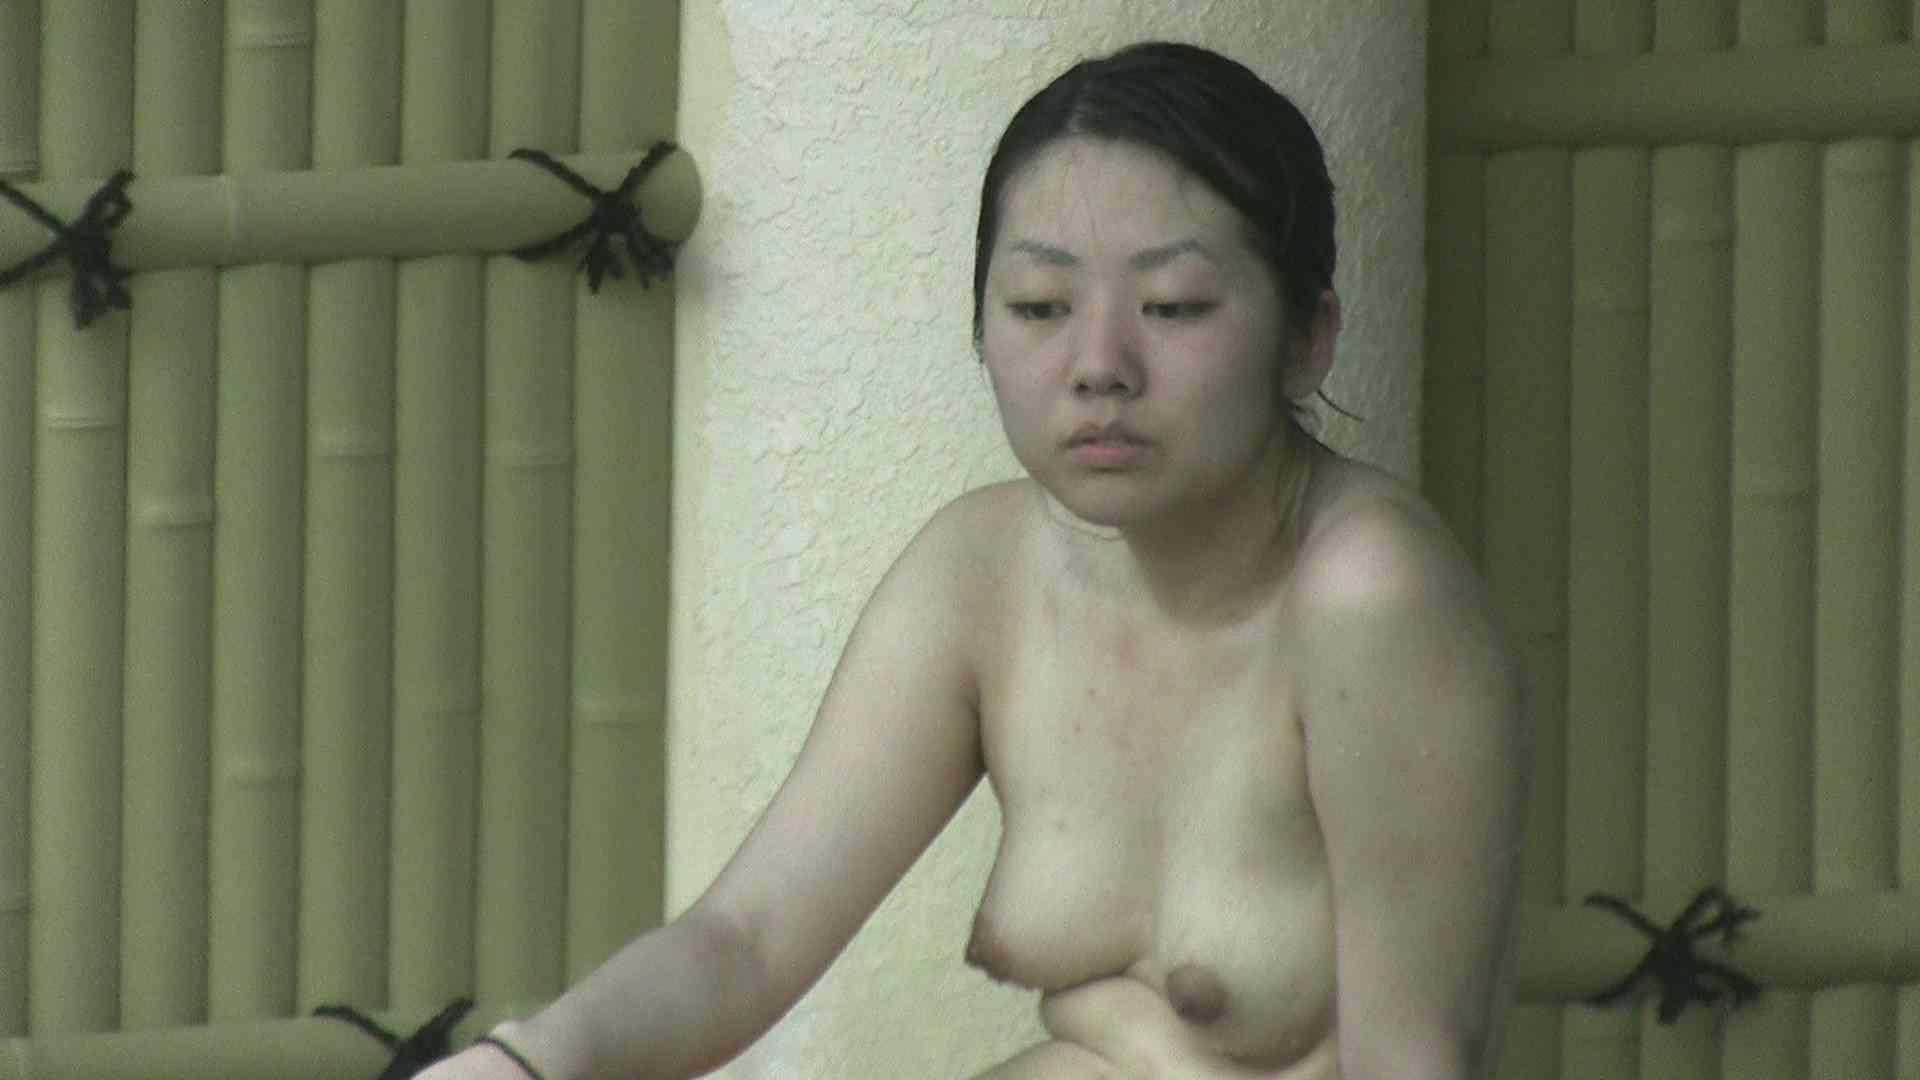 Aquaな露天風呂Vol.194 露天風呂編  110PIX 62